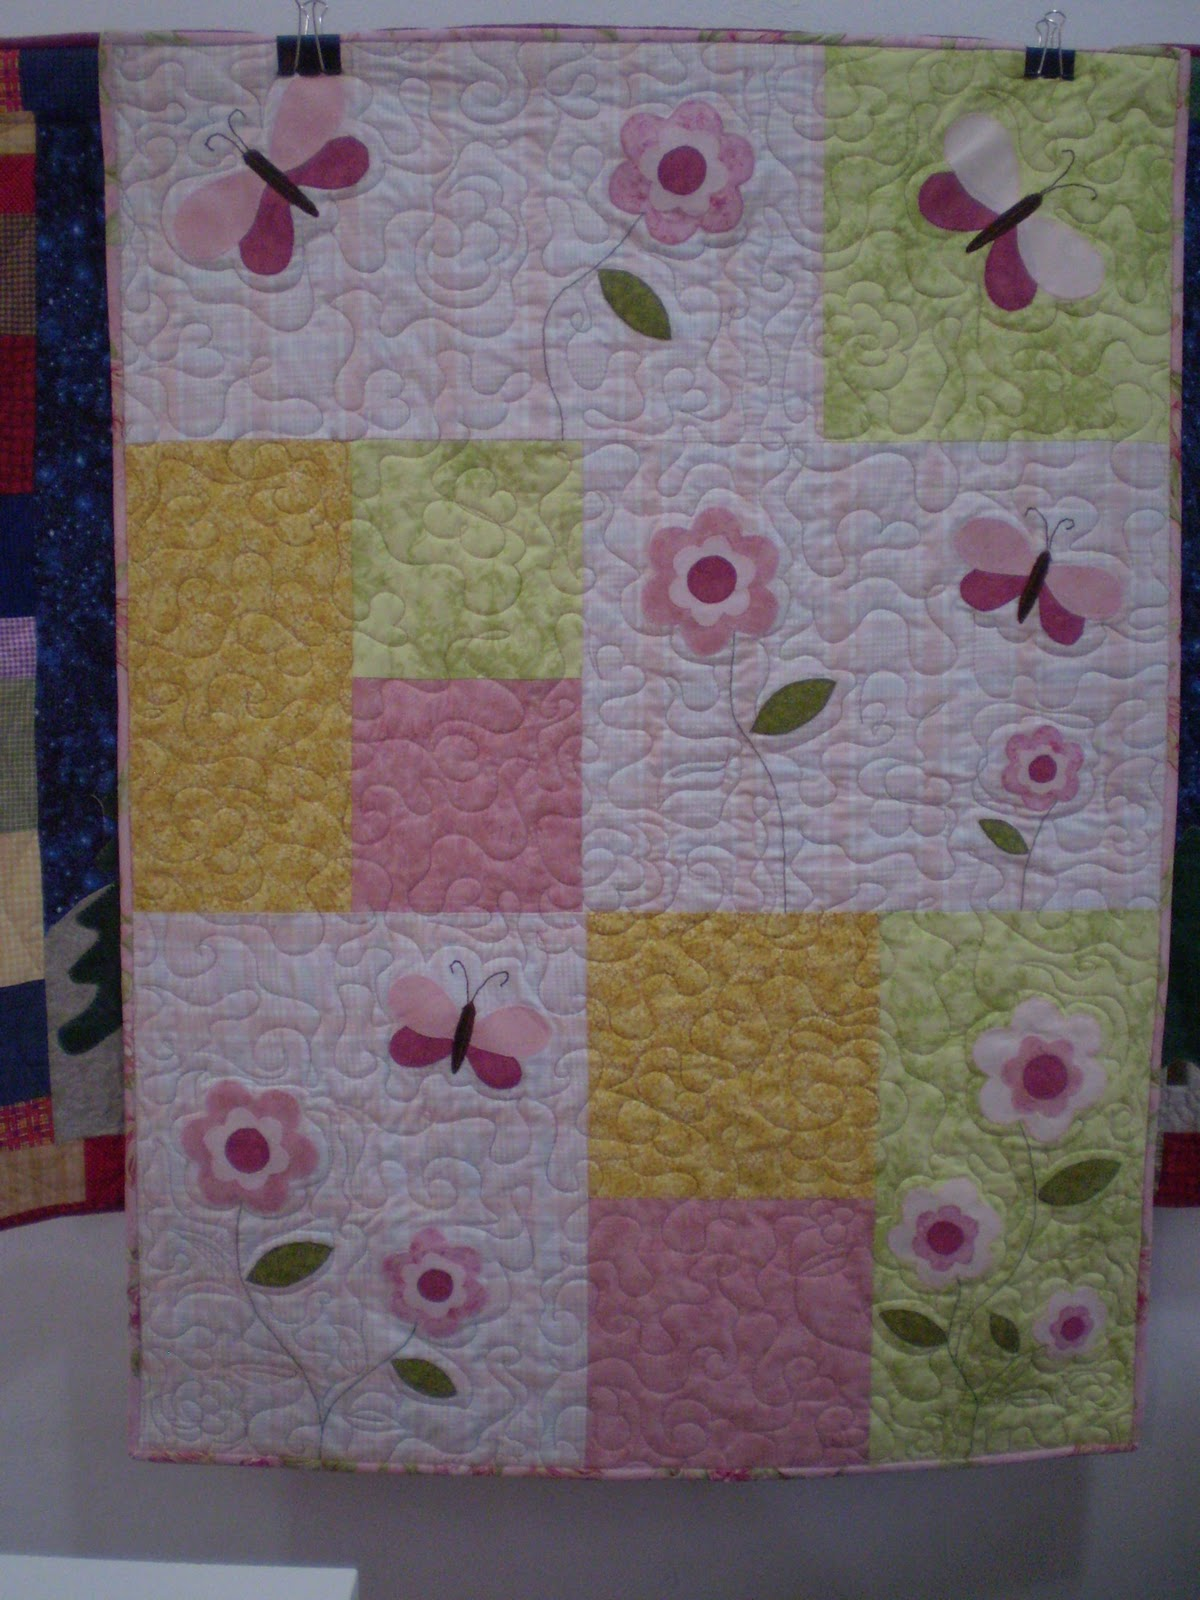 La casita del quilting quilts para beb s - La casita del patchwork ...